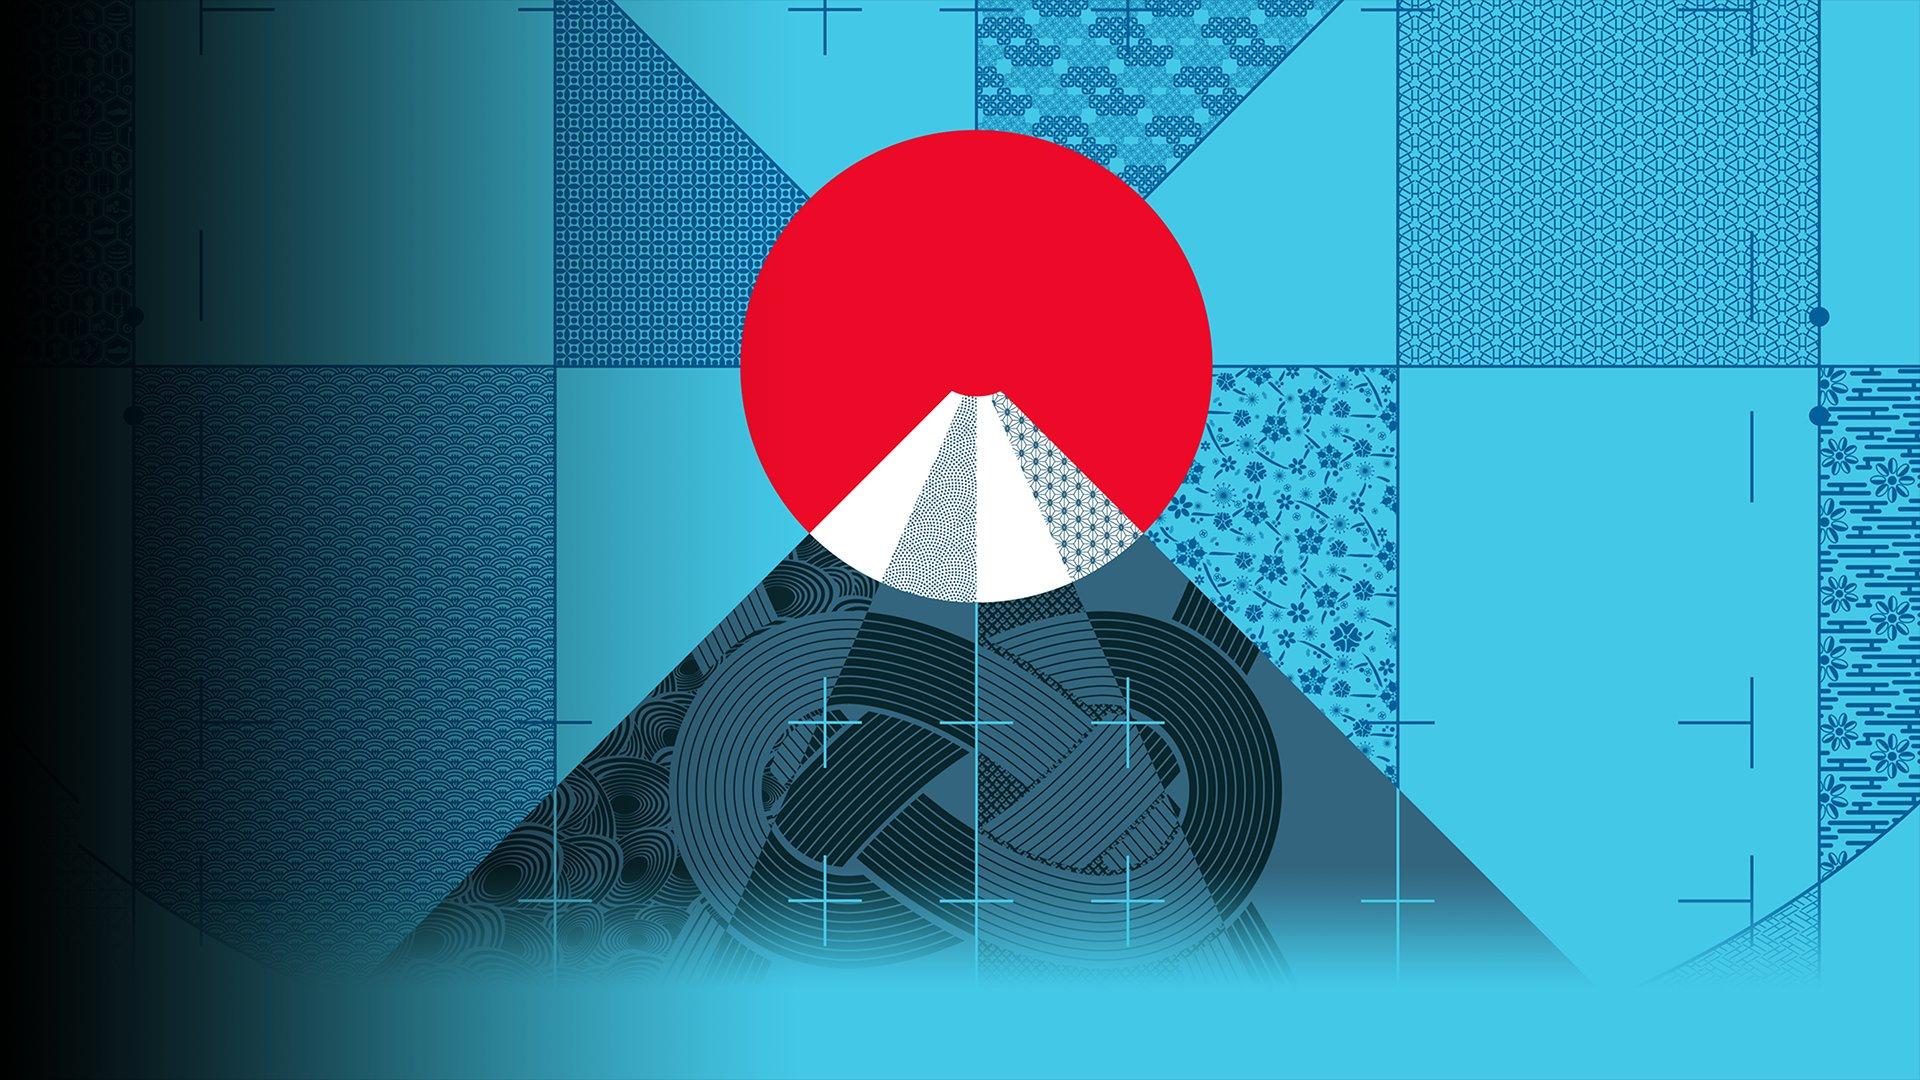 fond Japon - Samoa (16 - 6) : Voir l'essai de Lafaele en vidéo